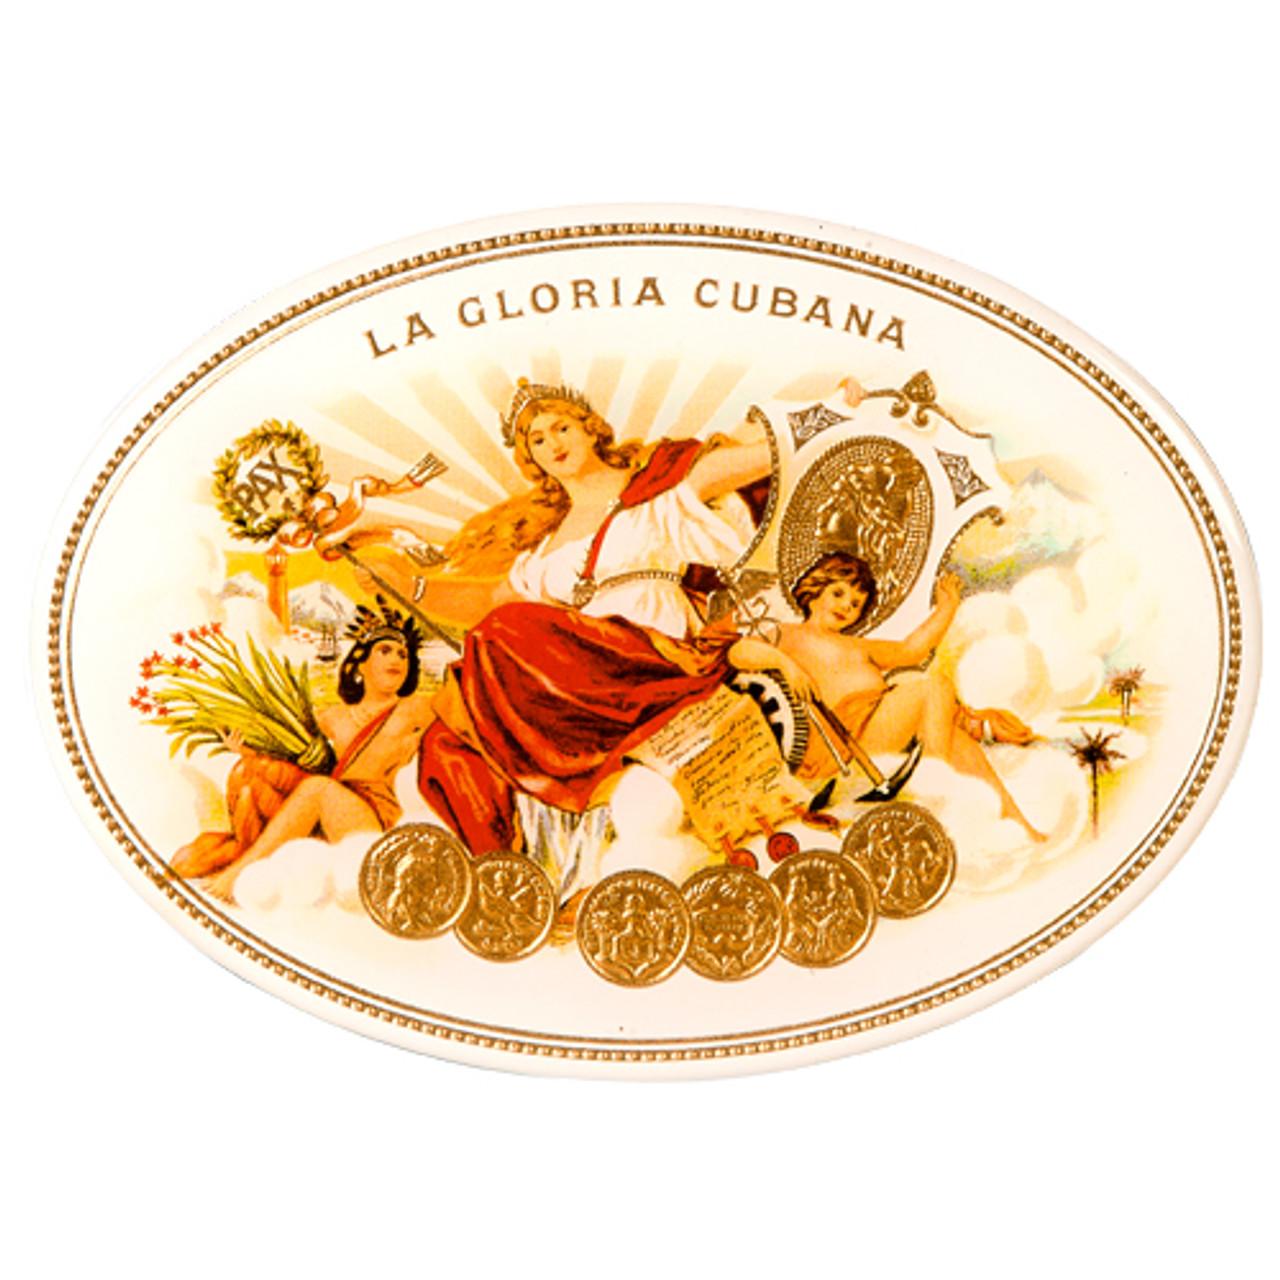 La Gloria Cubana Artesanos de Miami Corona Especiale Cigars - 6 x 54 (Box of 25)